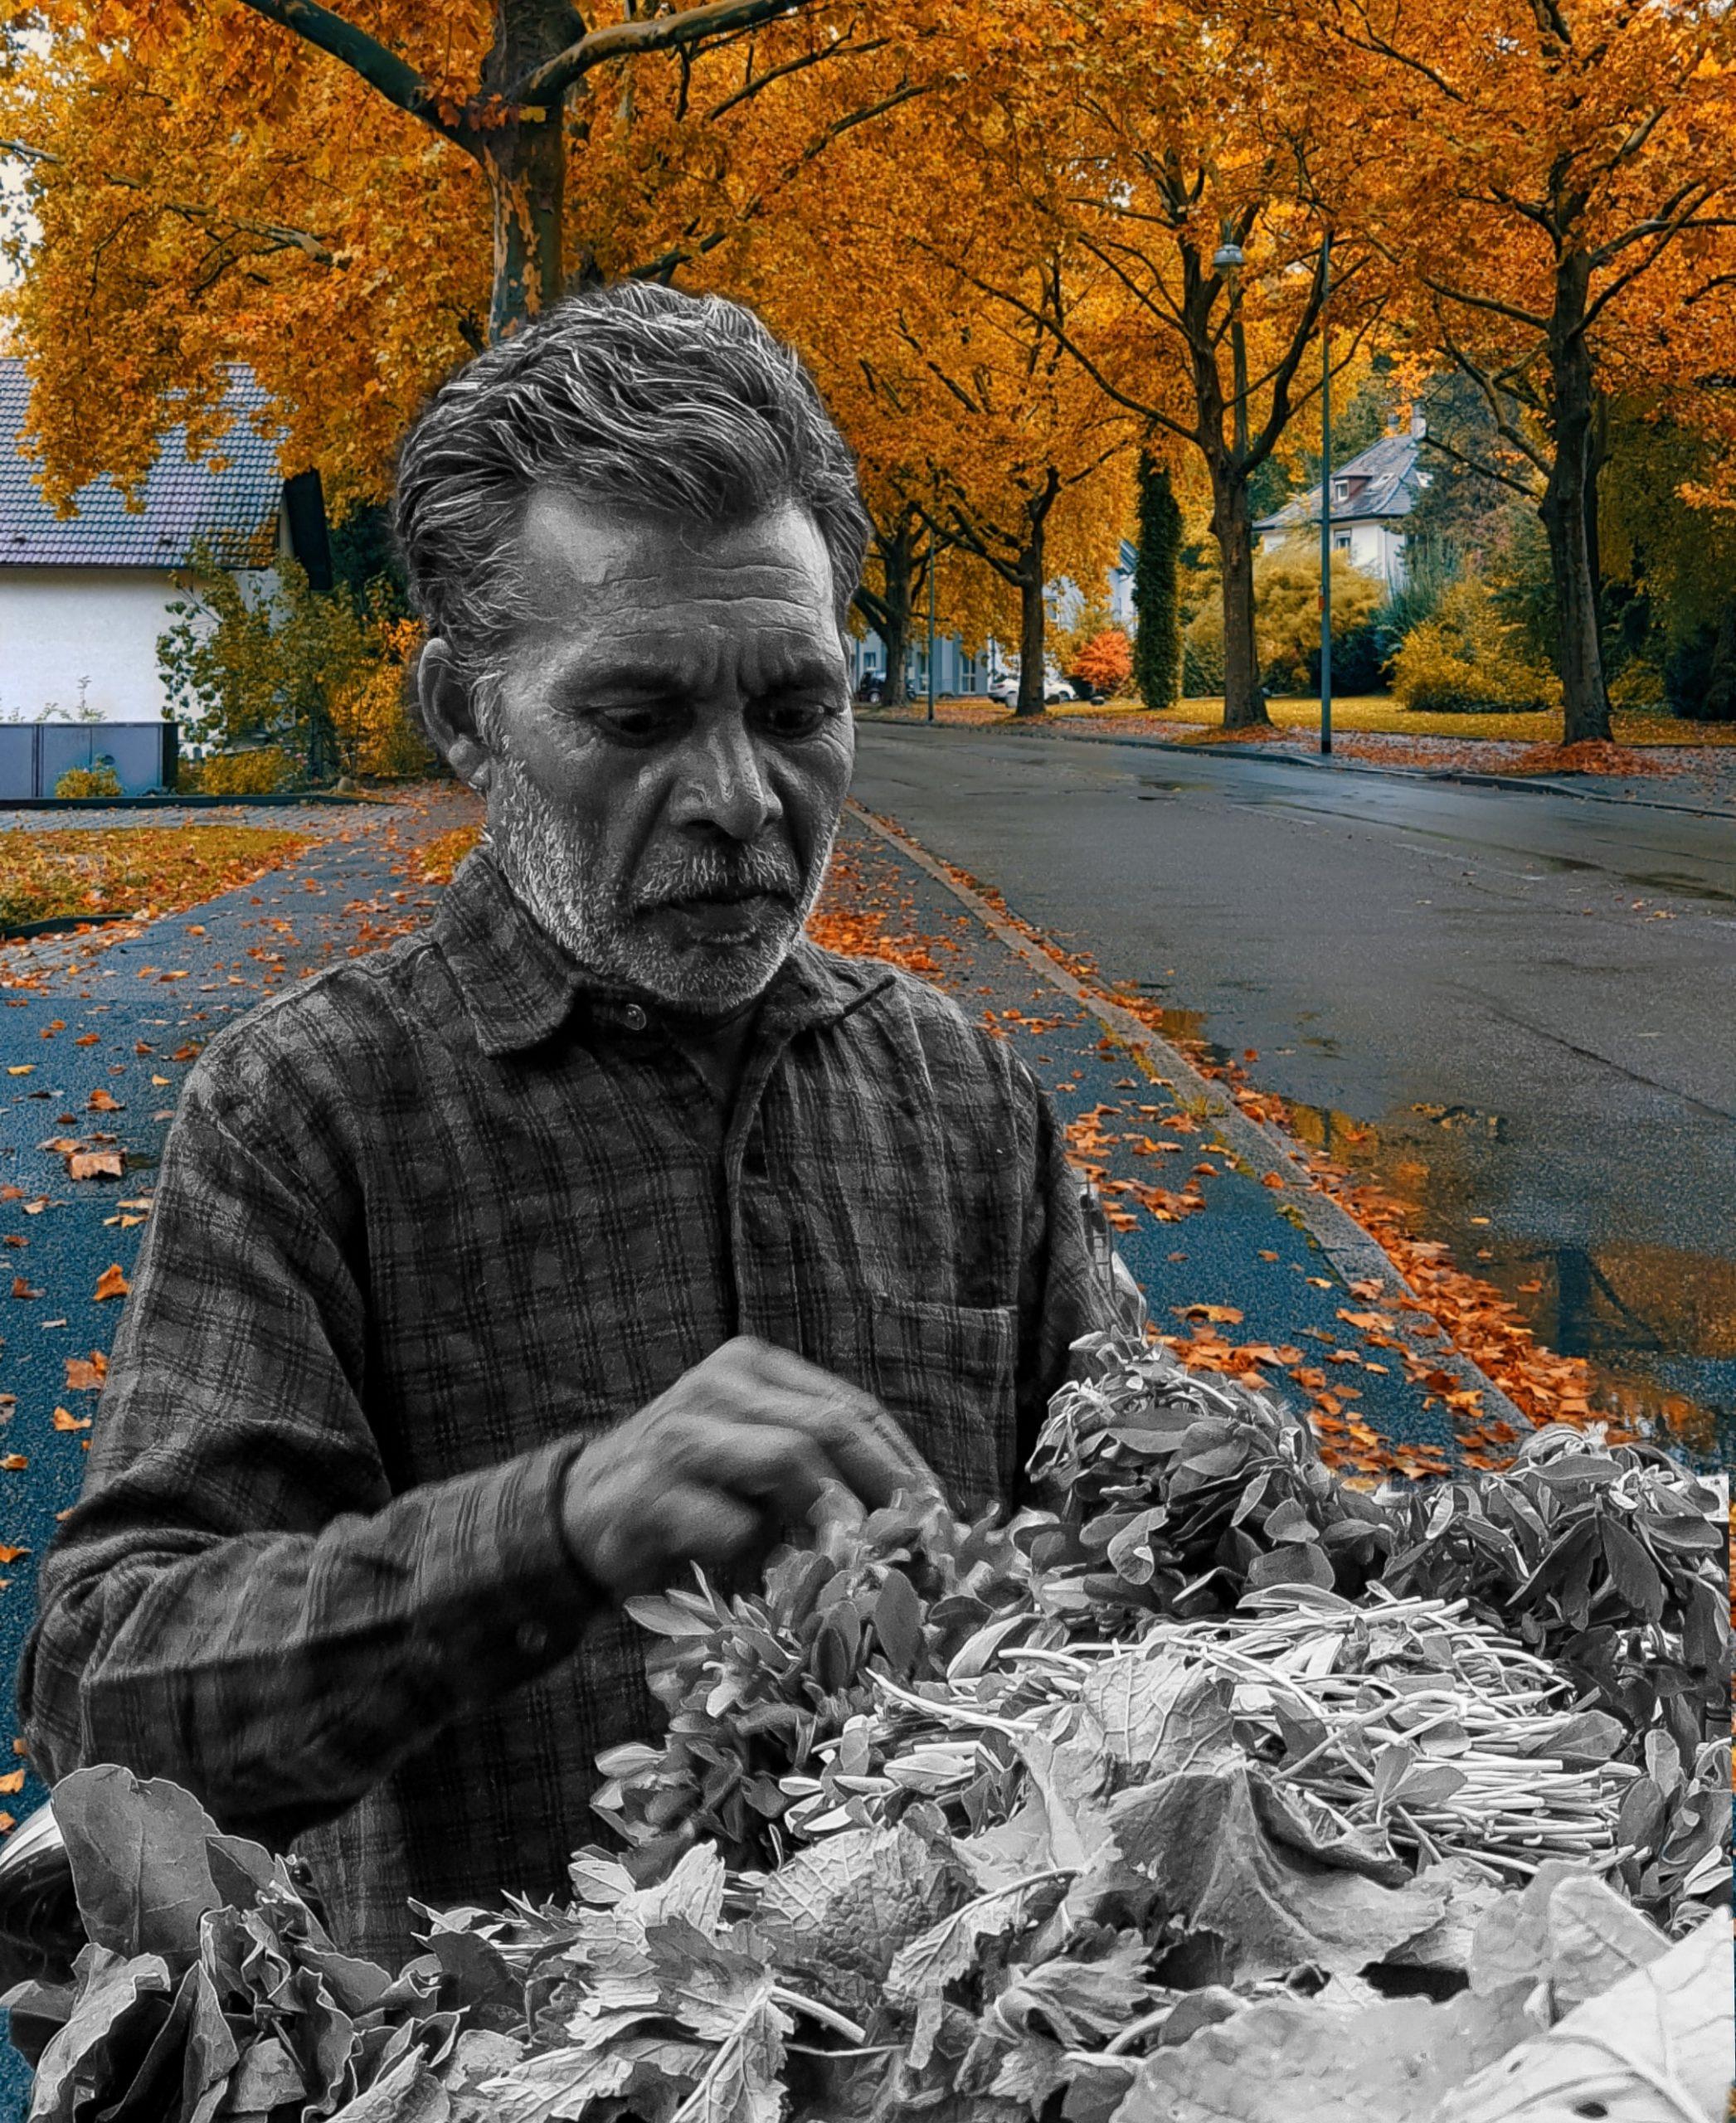 A vegetables seller